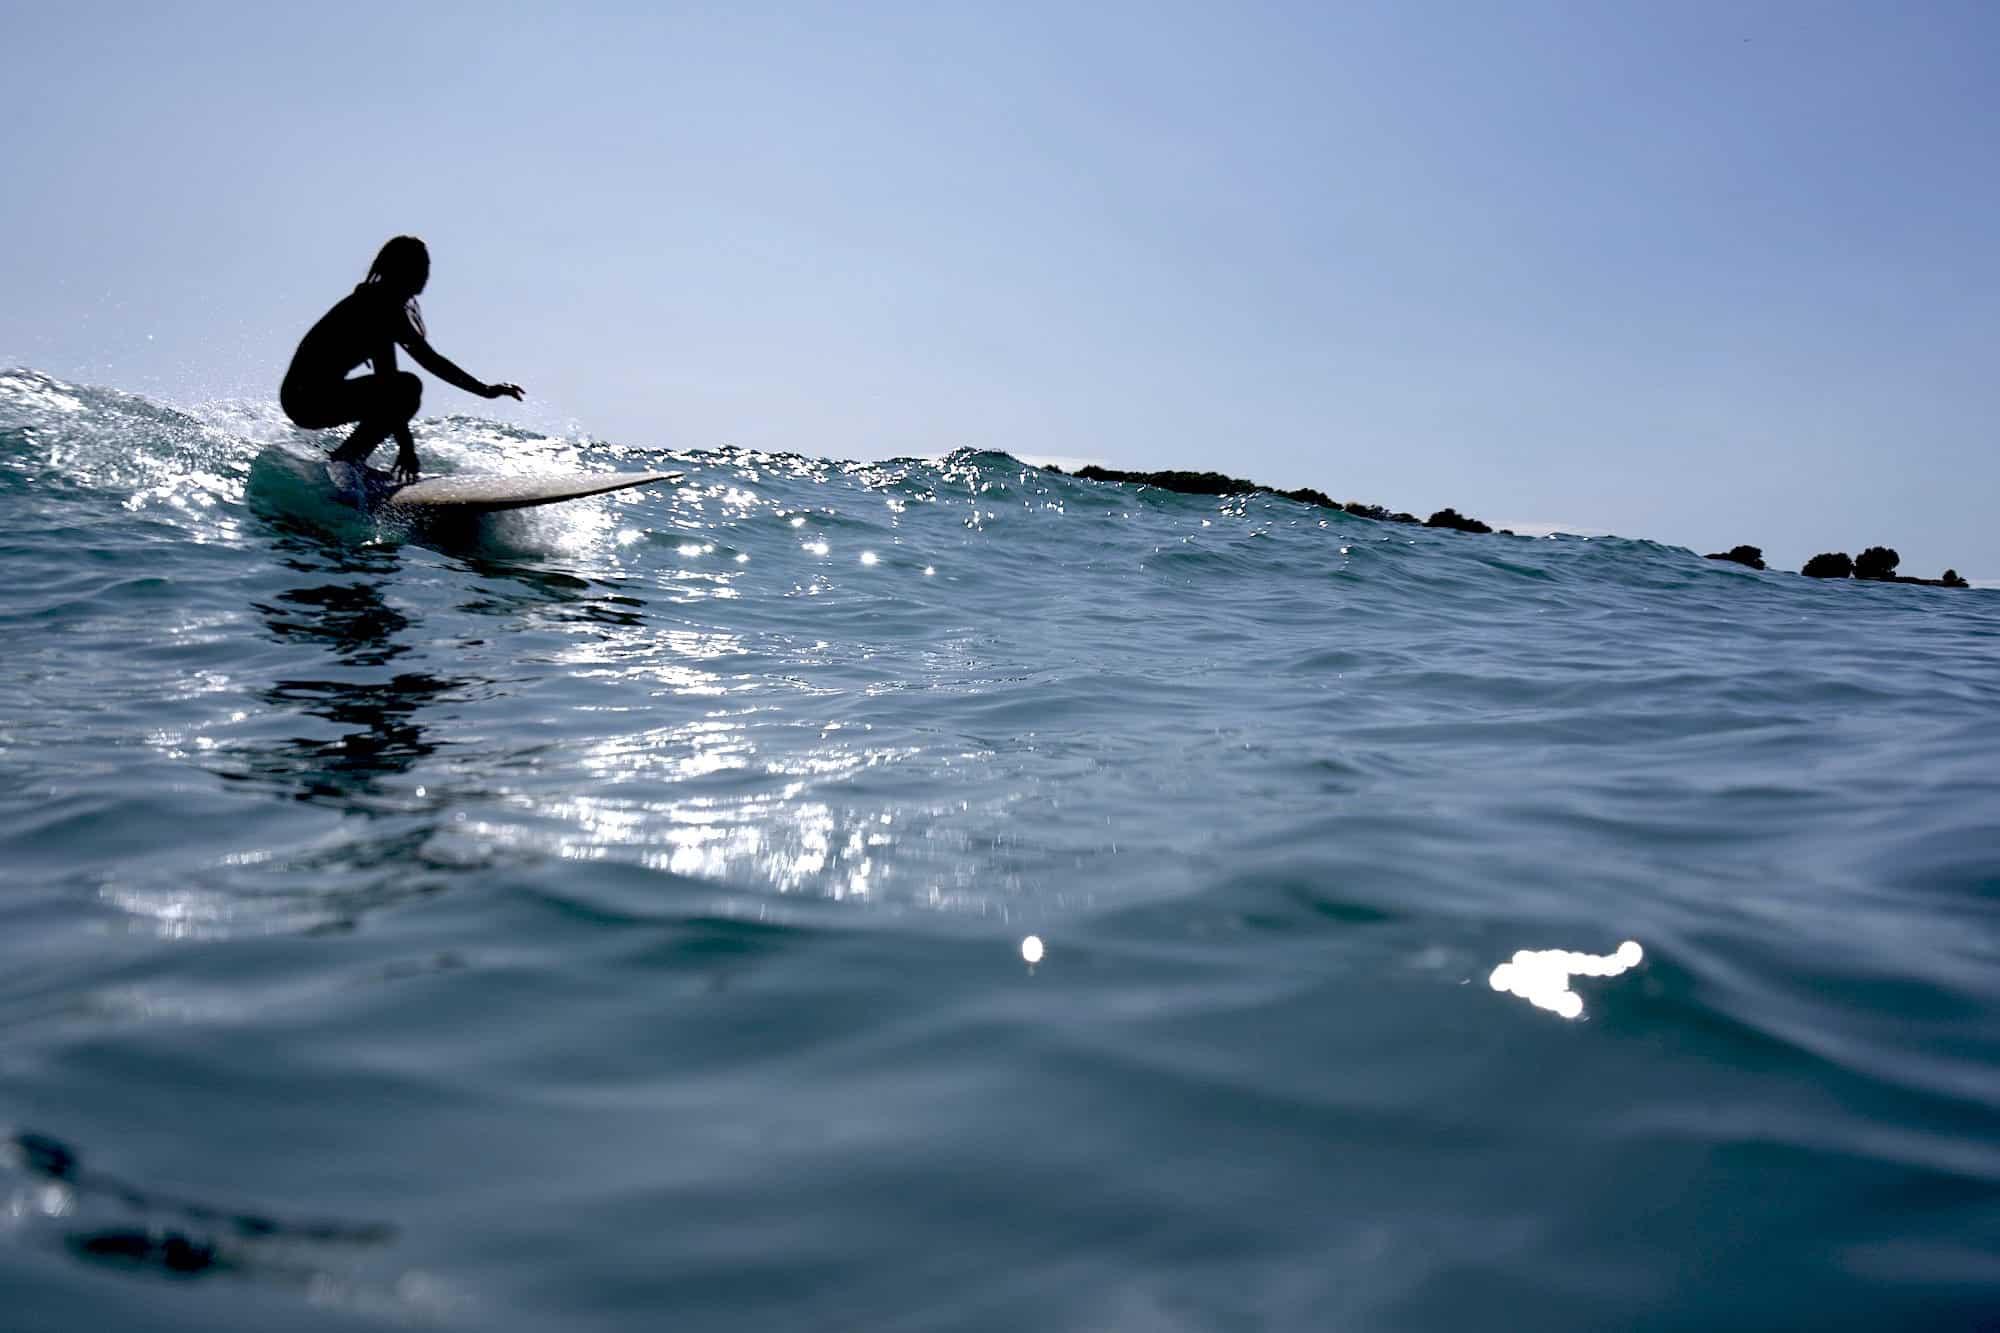 The origins of surfing